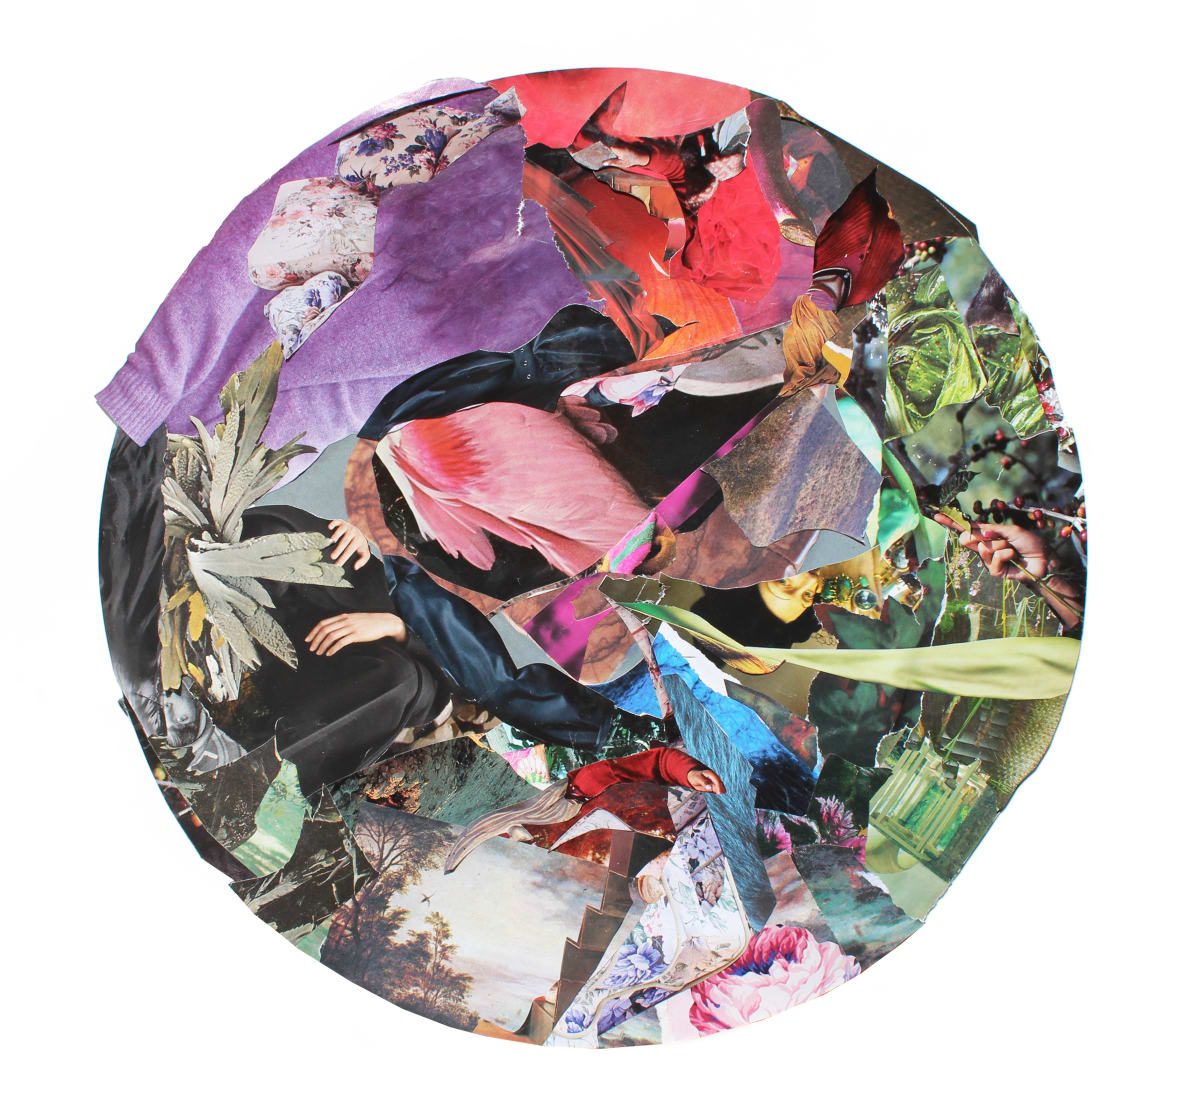 Untitled III (Circle series)